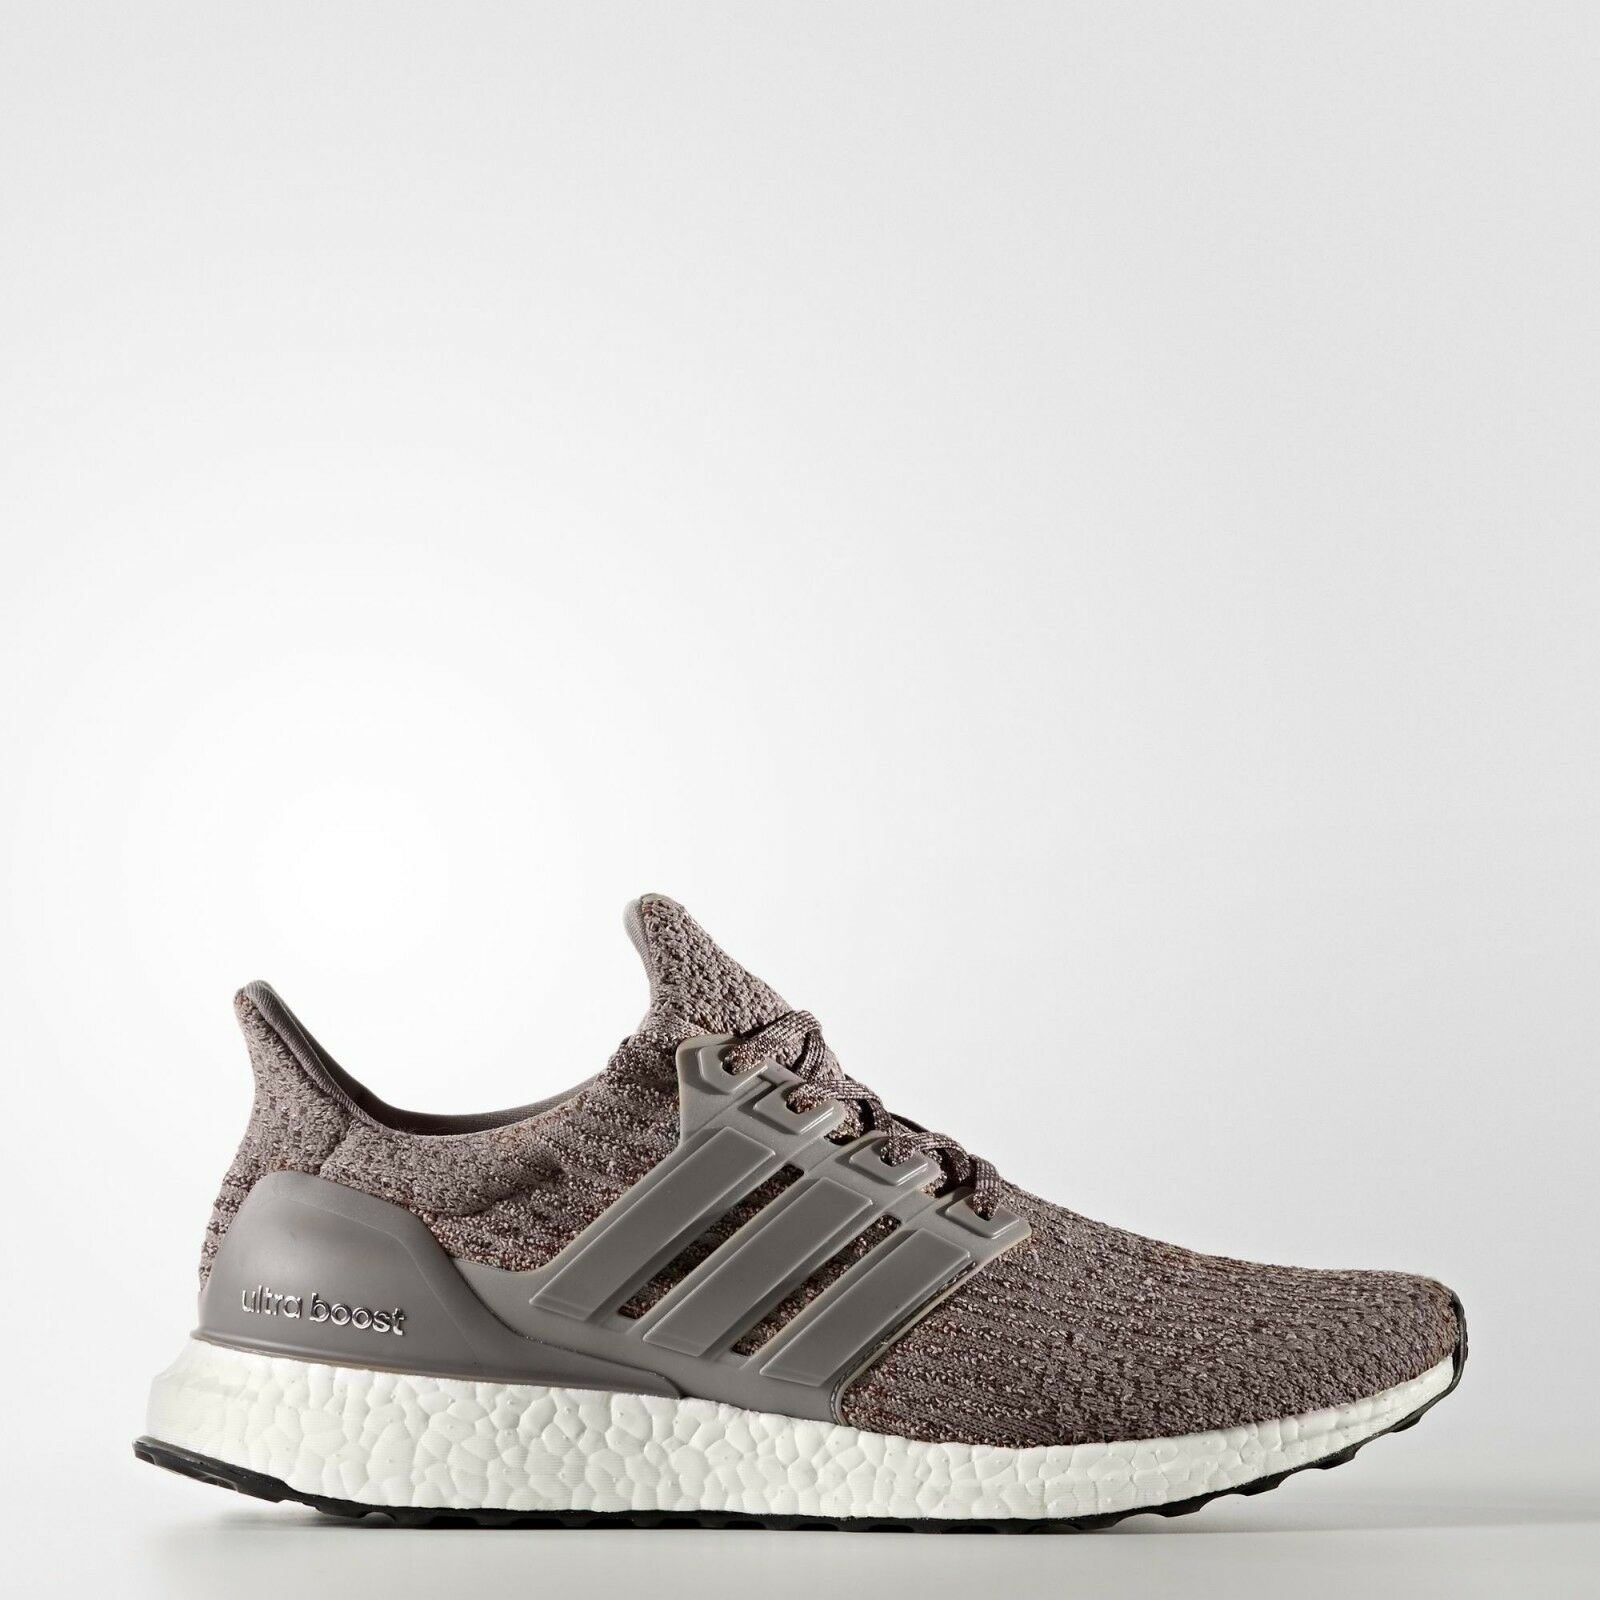 Adidas - impuls - erde 3.0 grauen größe 11,5.cg3040 yeezy nmd - pk